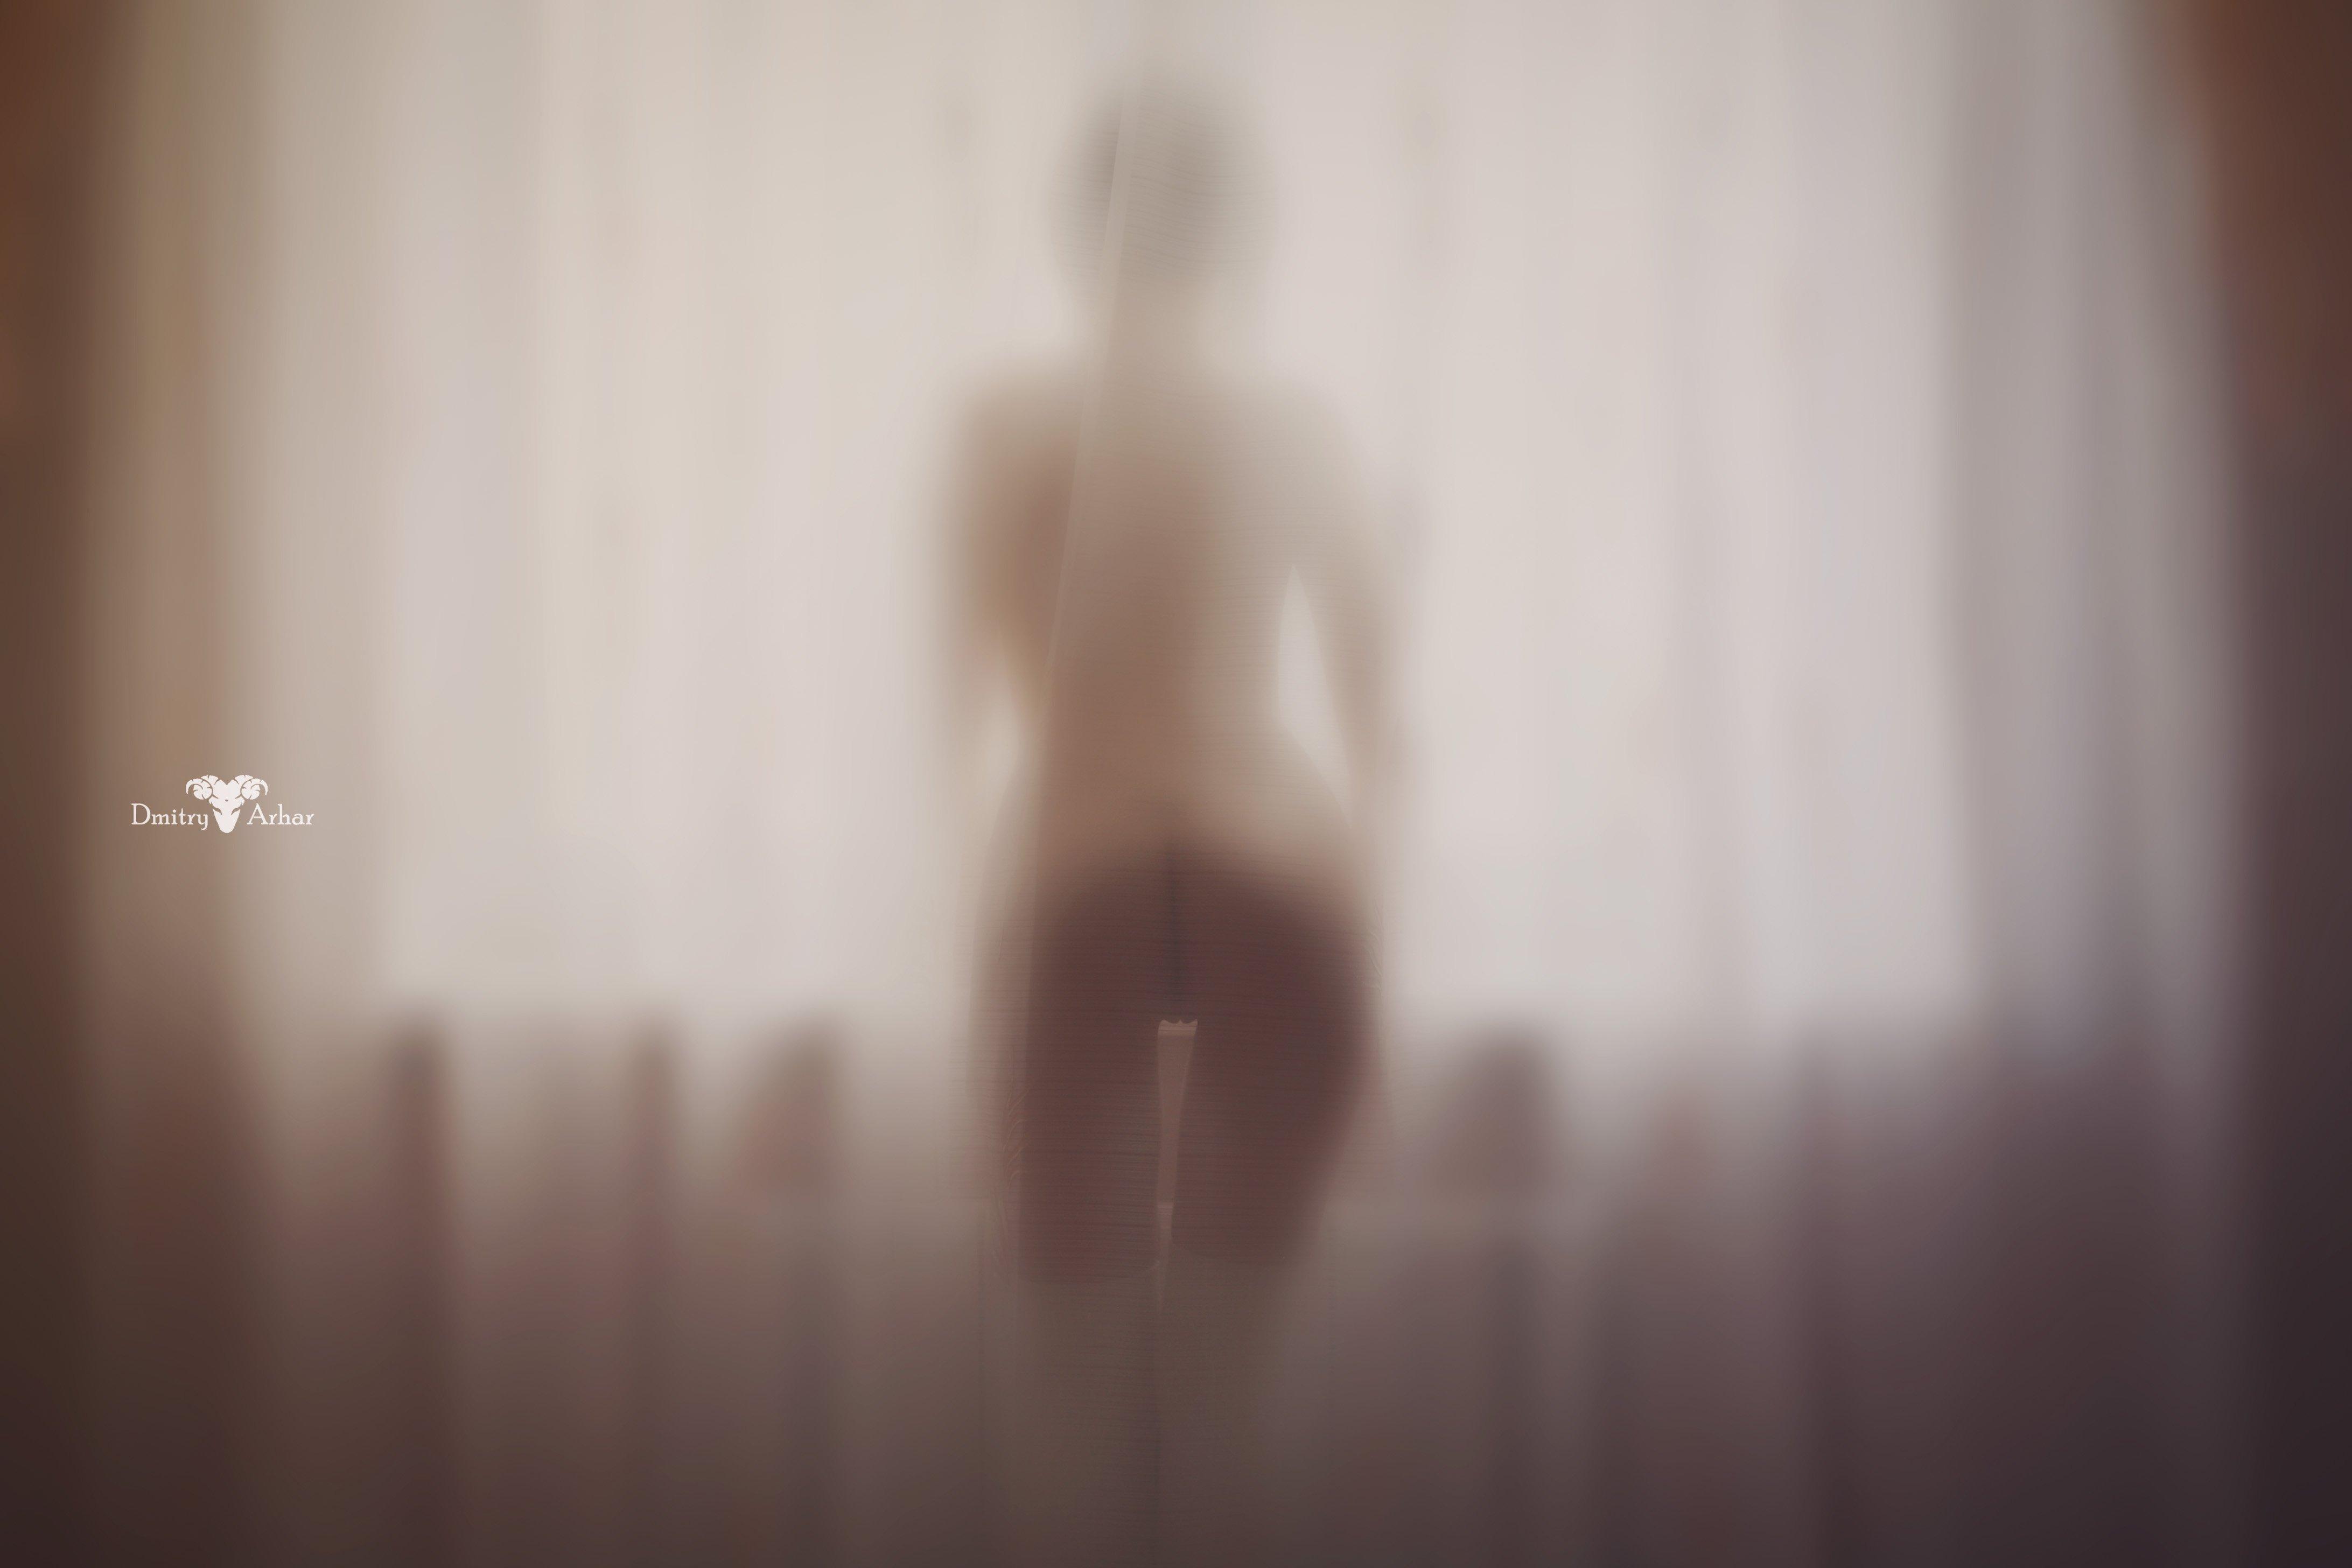 Art nu, Beautiful, Dmitry Arhar, Girl, Model, Nu, Nude, People, Photo, Woman, Девушка, Красота, Нежность, Ню, Портрет девушки, Портфолио, Утро, Фото, Фотосессия, Dmitry Arhar